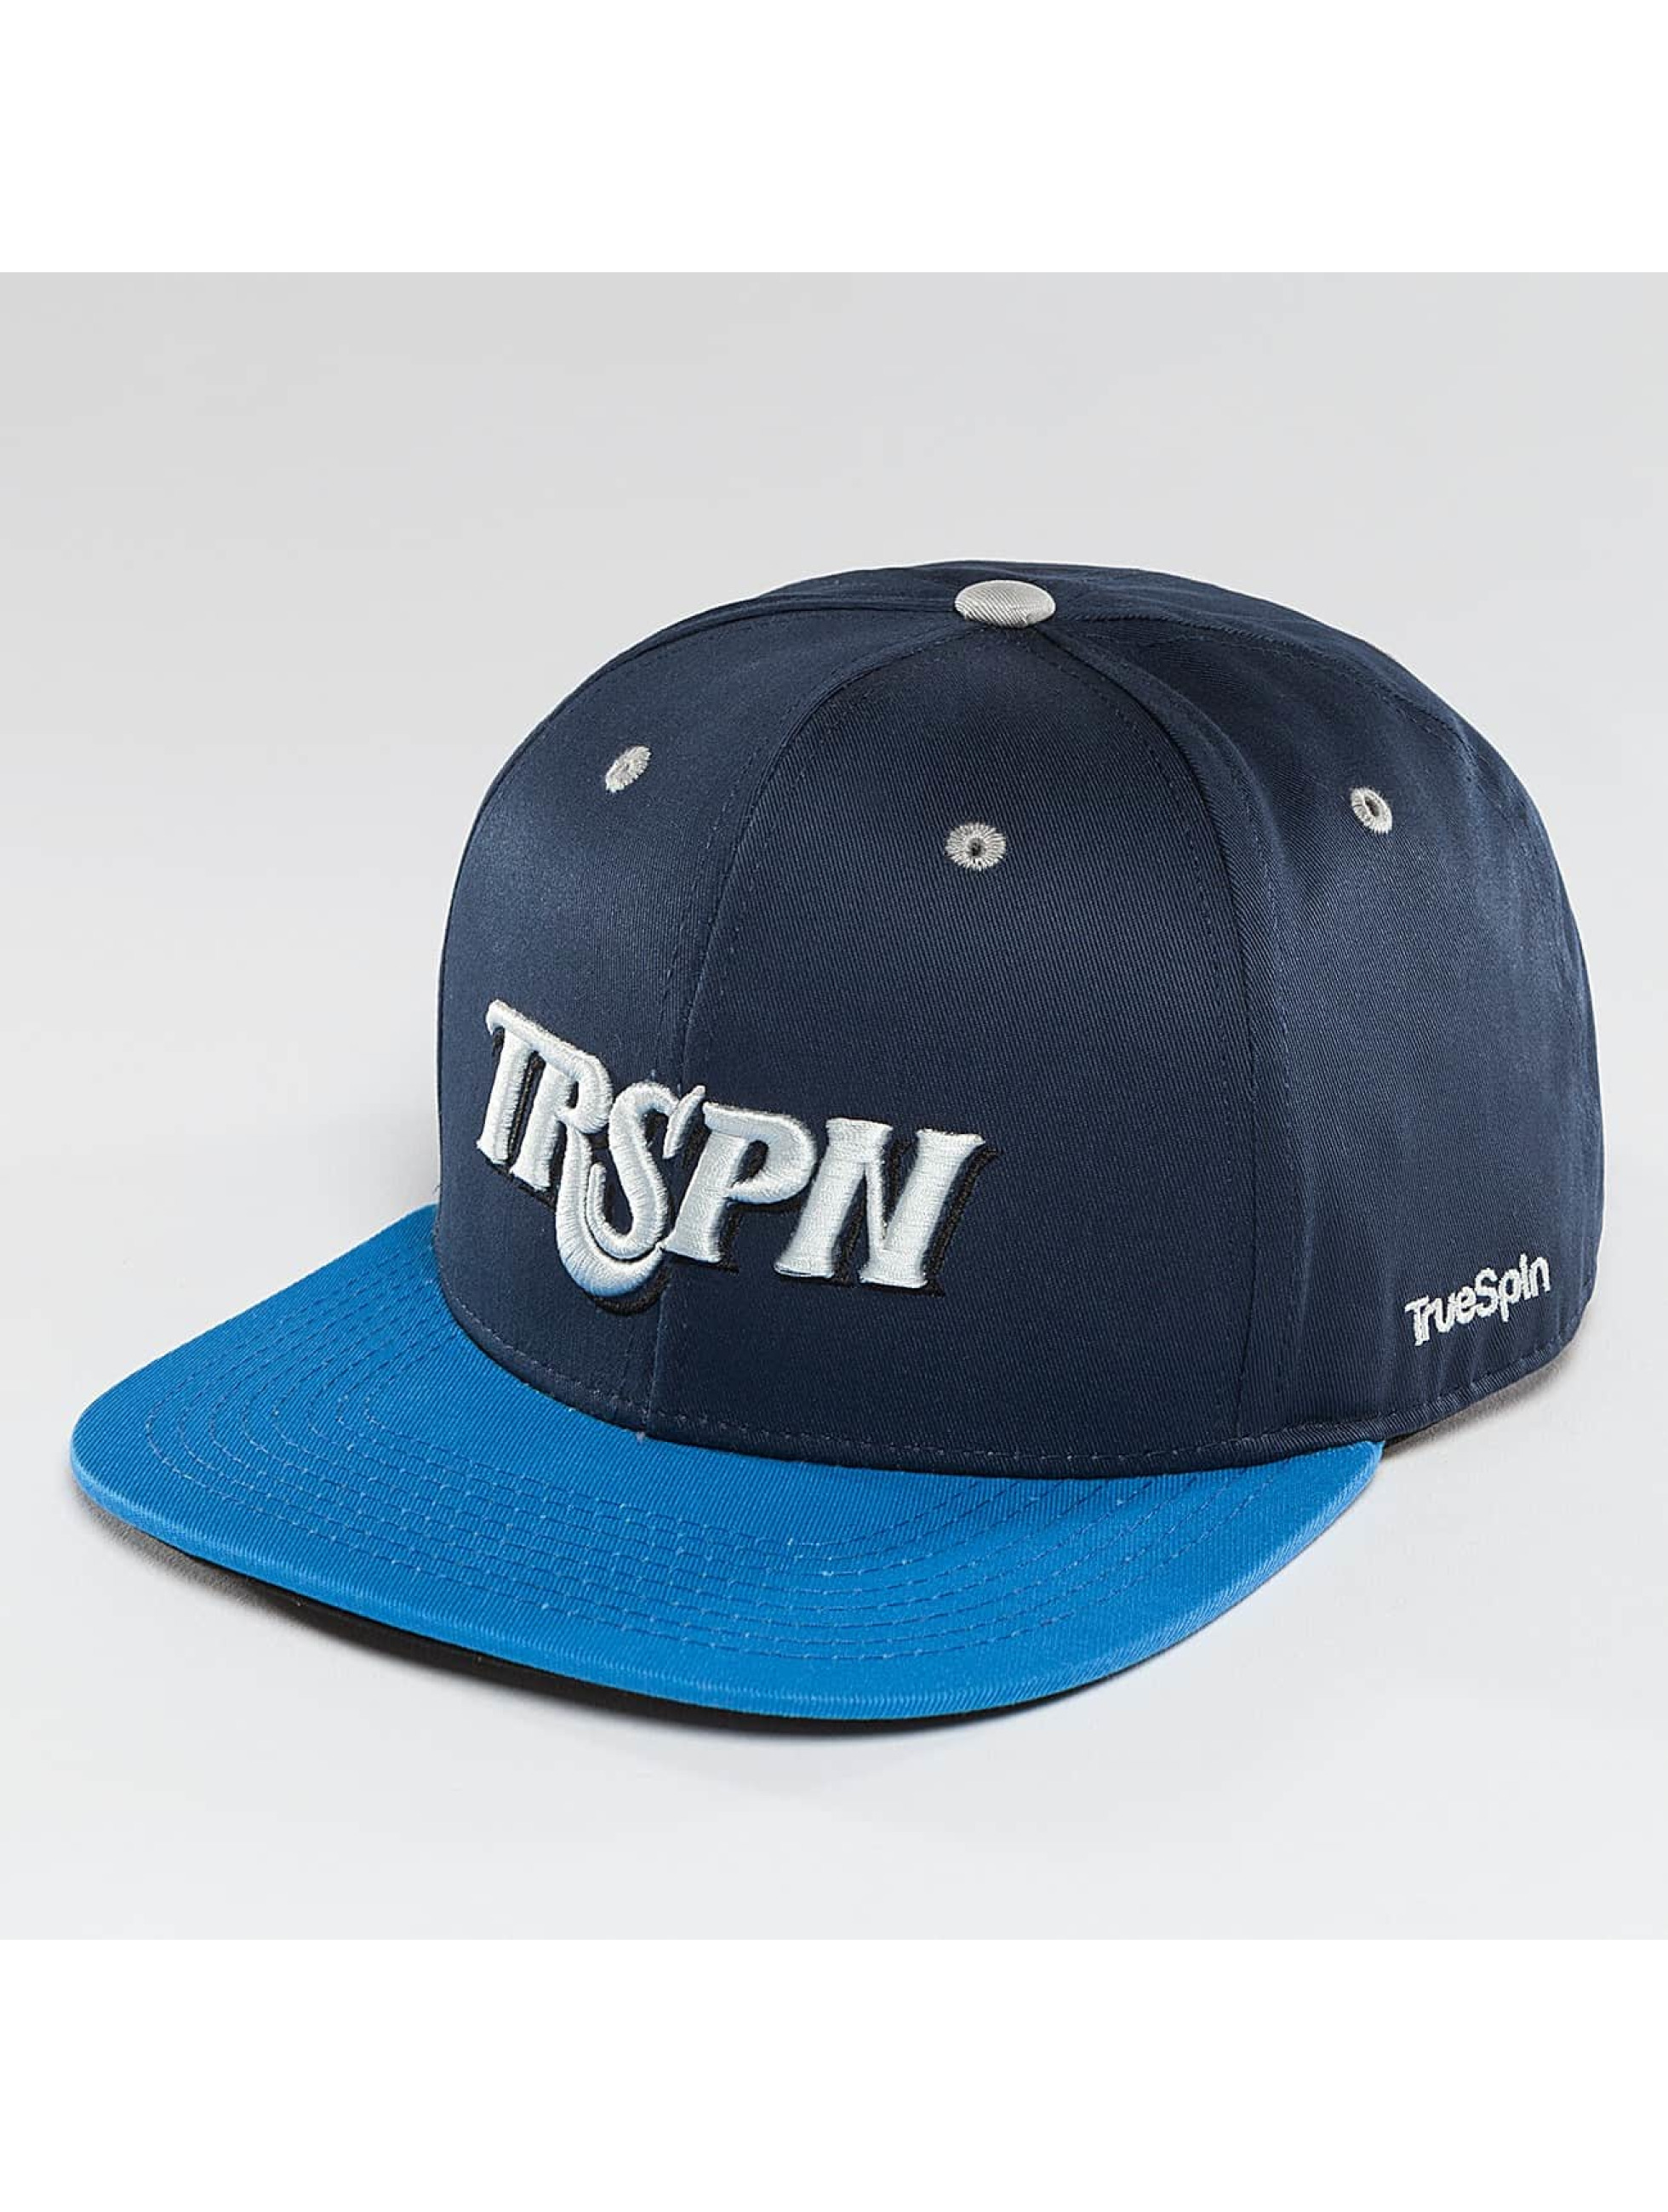 TrueSpin Кепка с застёжкой Team TRSPN синий